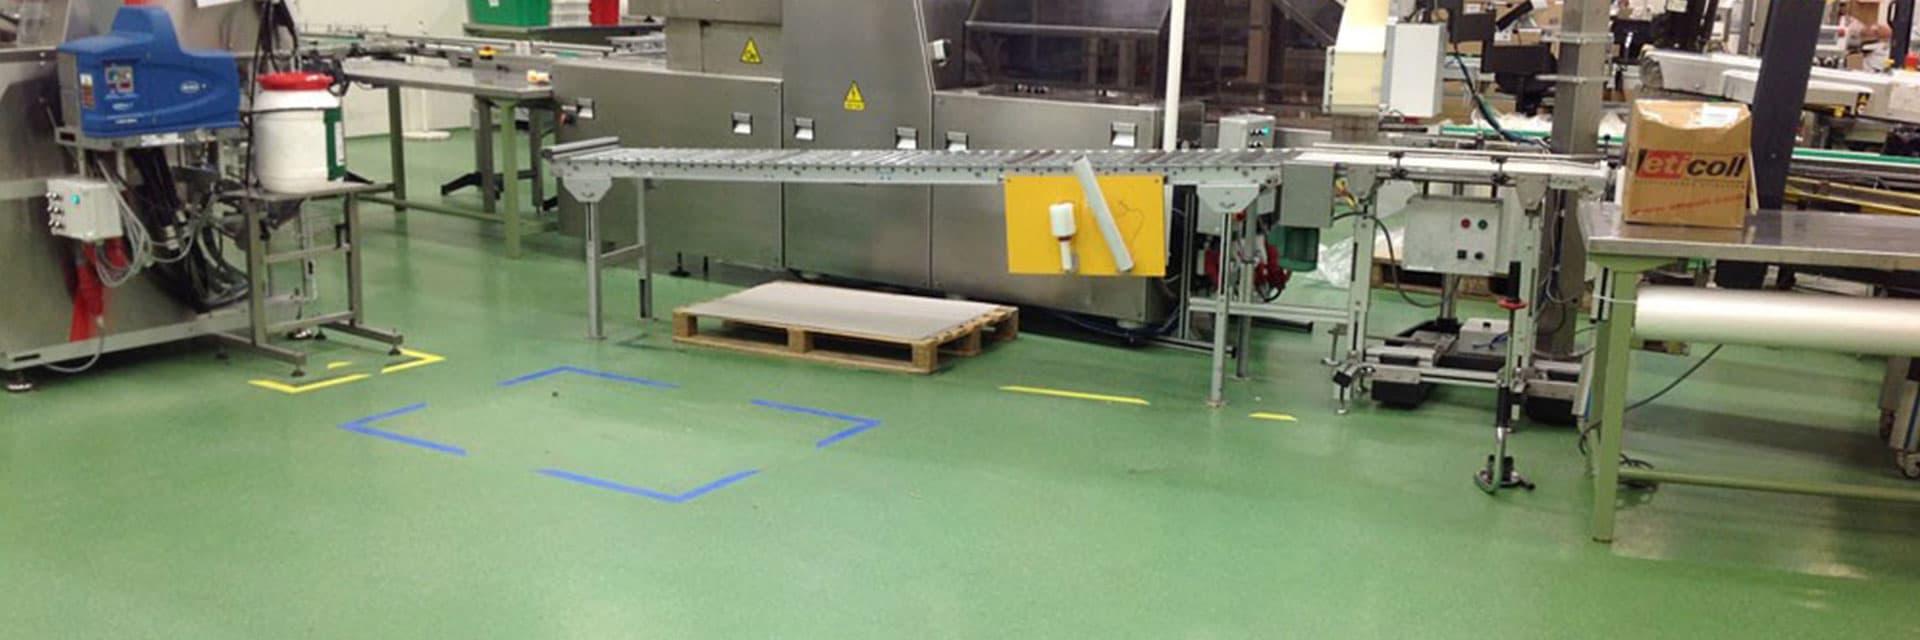 HACCP vloer